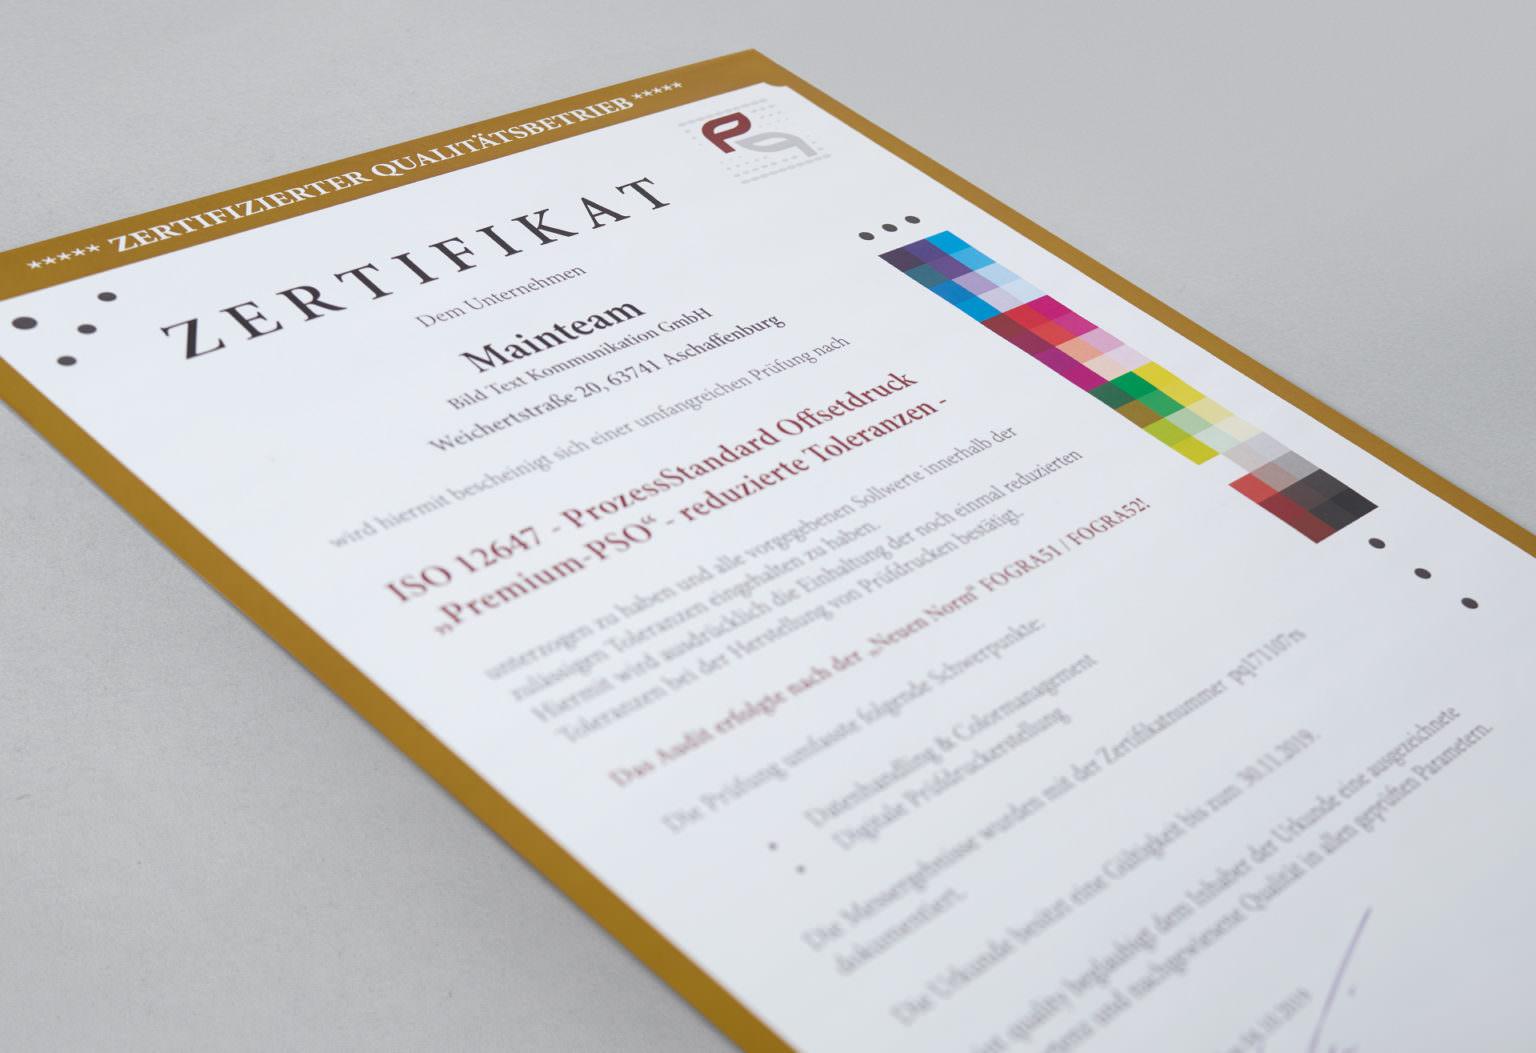 Zertifizierung nach PSO